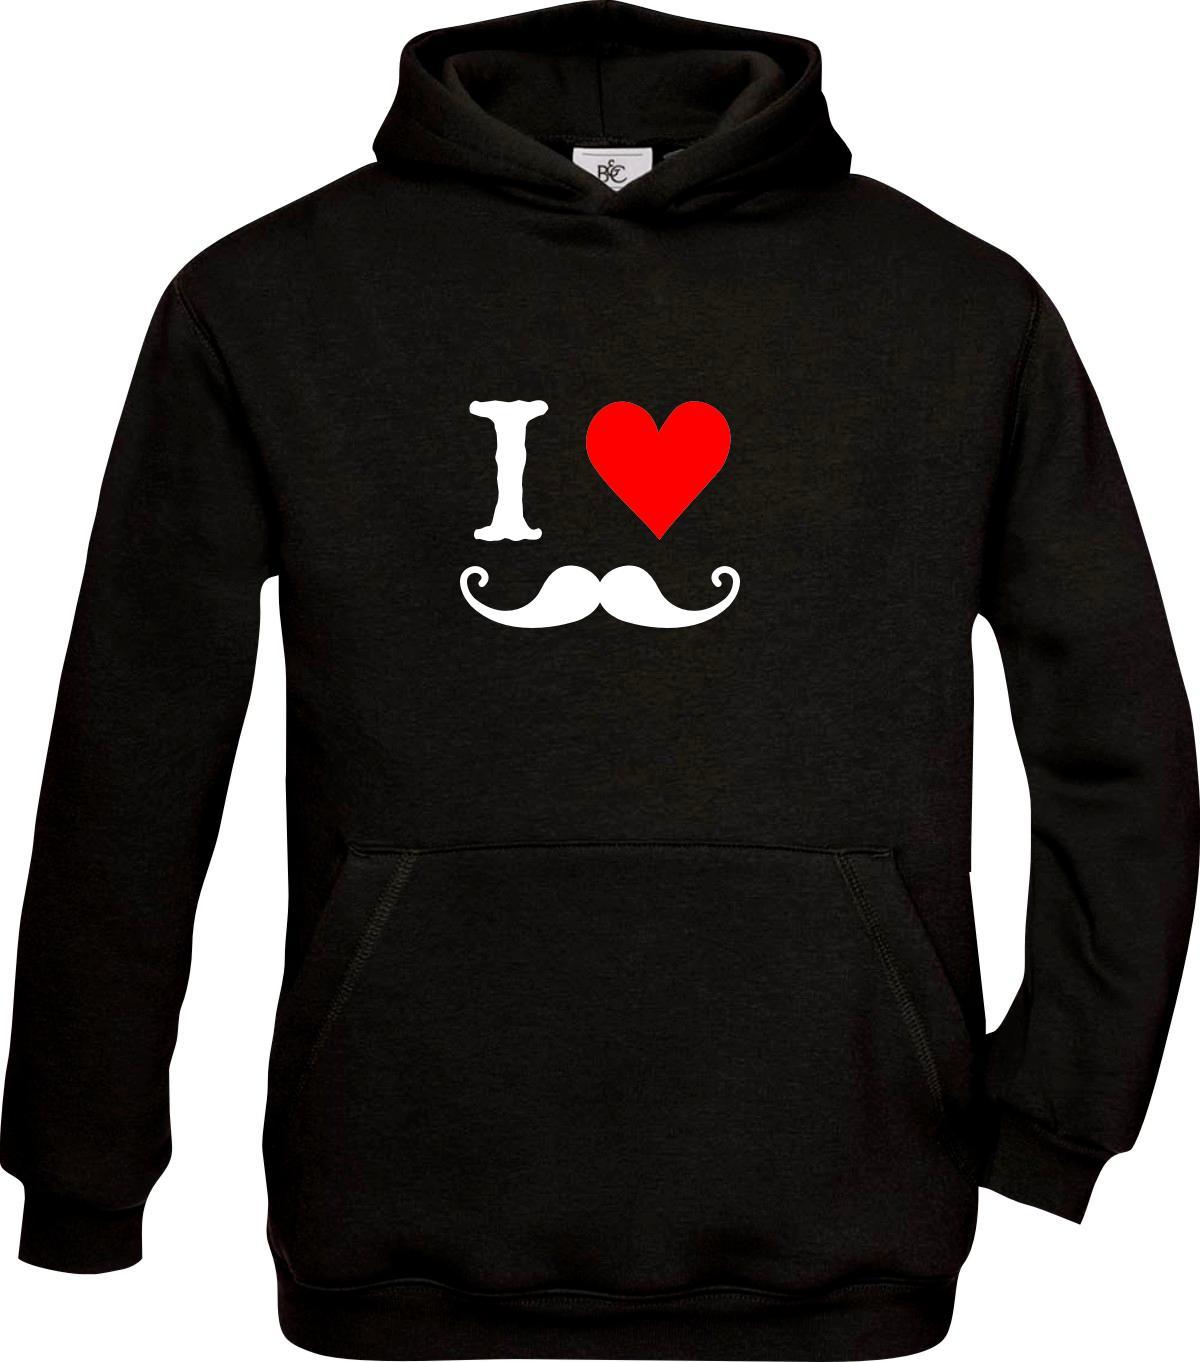 Kids-Hooded-I-Love-Moustache-Schautzbart-FUN-kult-98-164